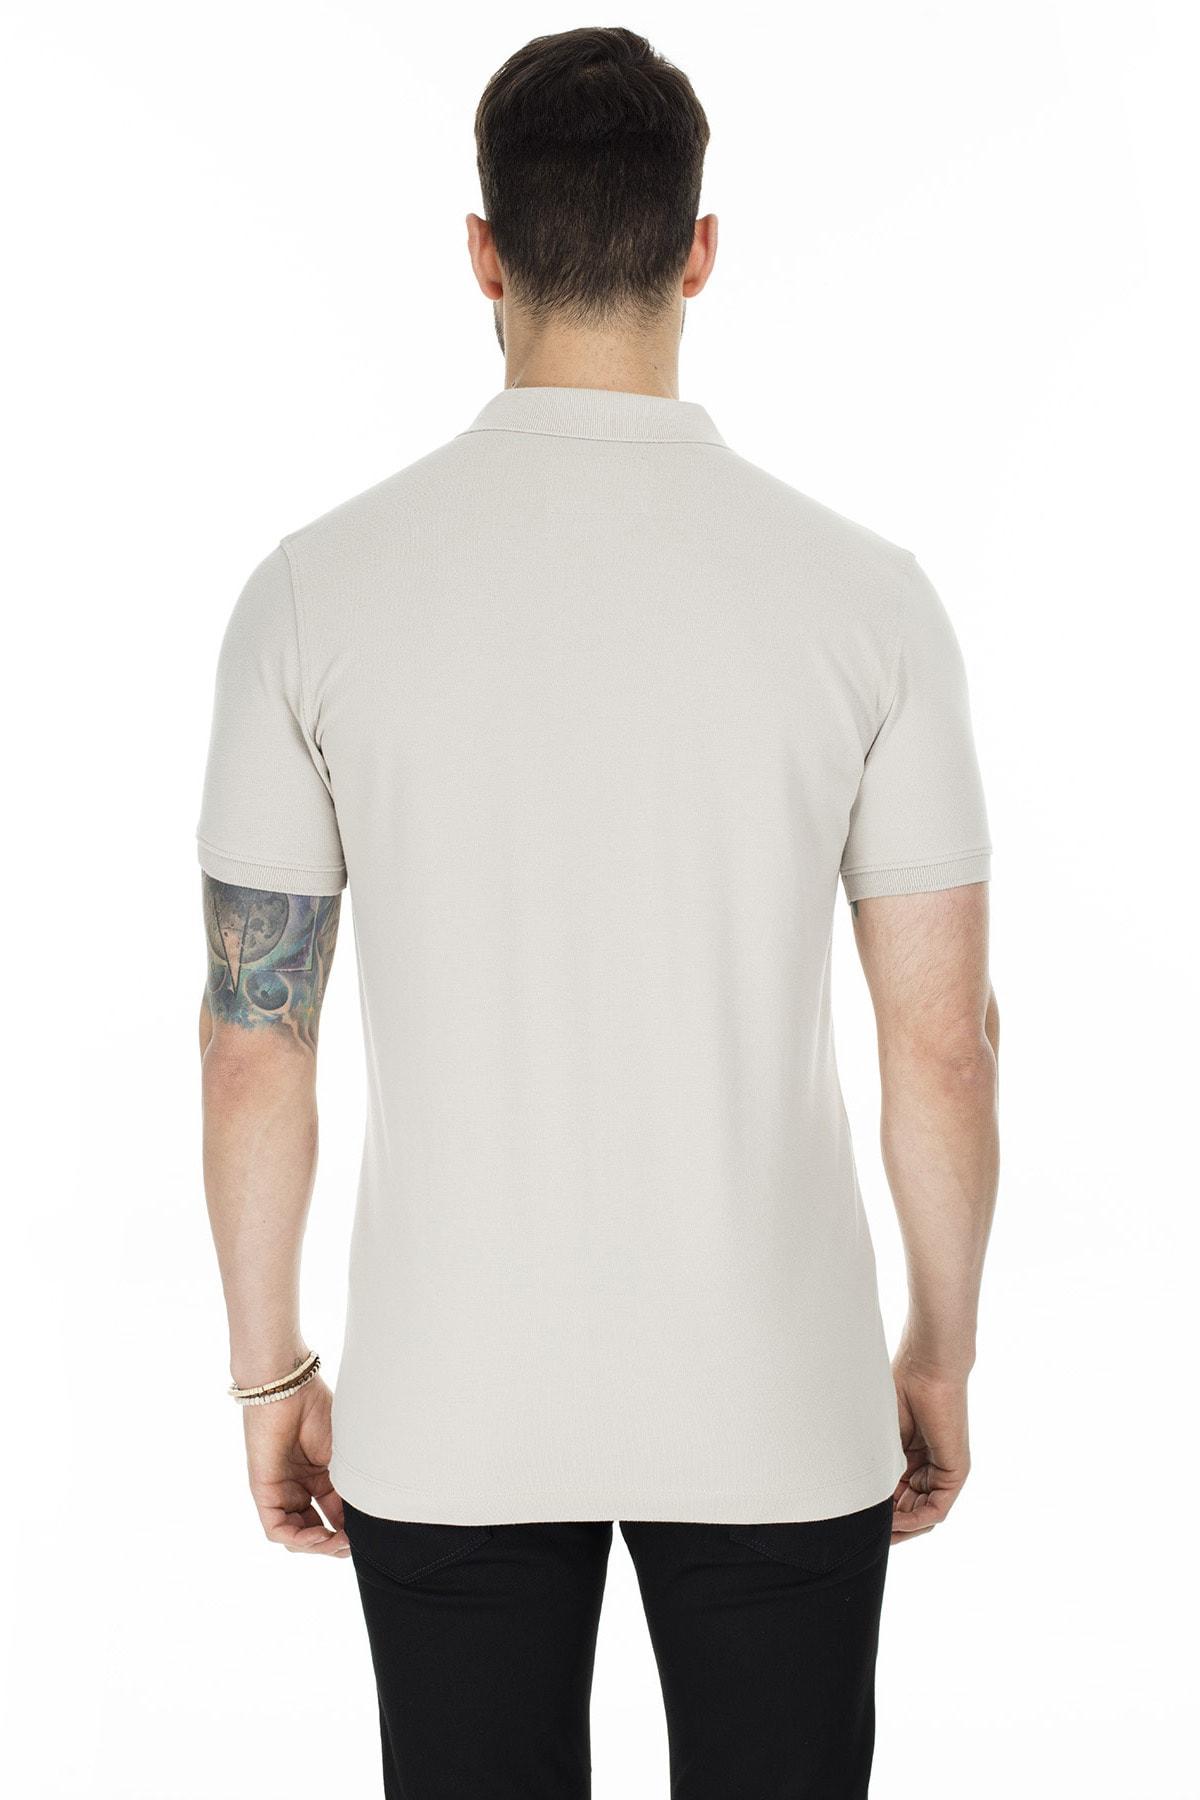 Lufian Laon Spor Polo T- Shirt Taş 1